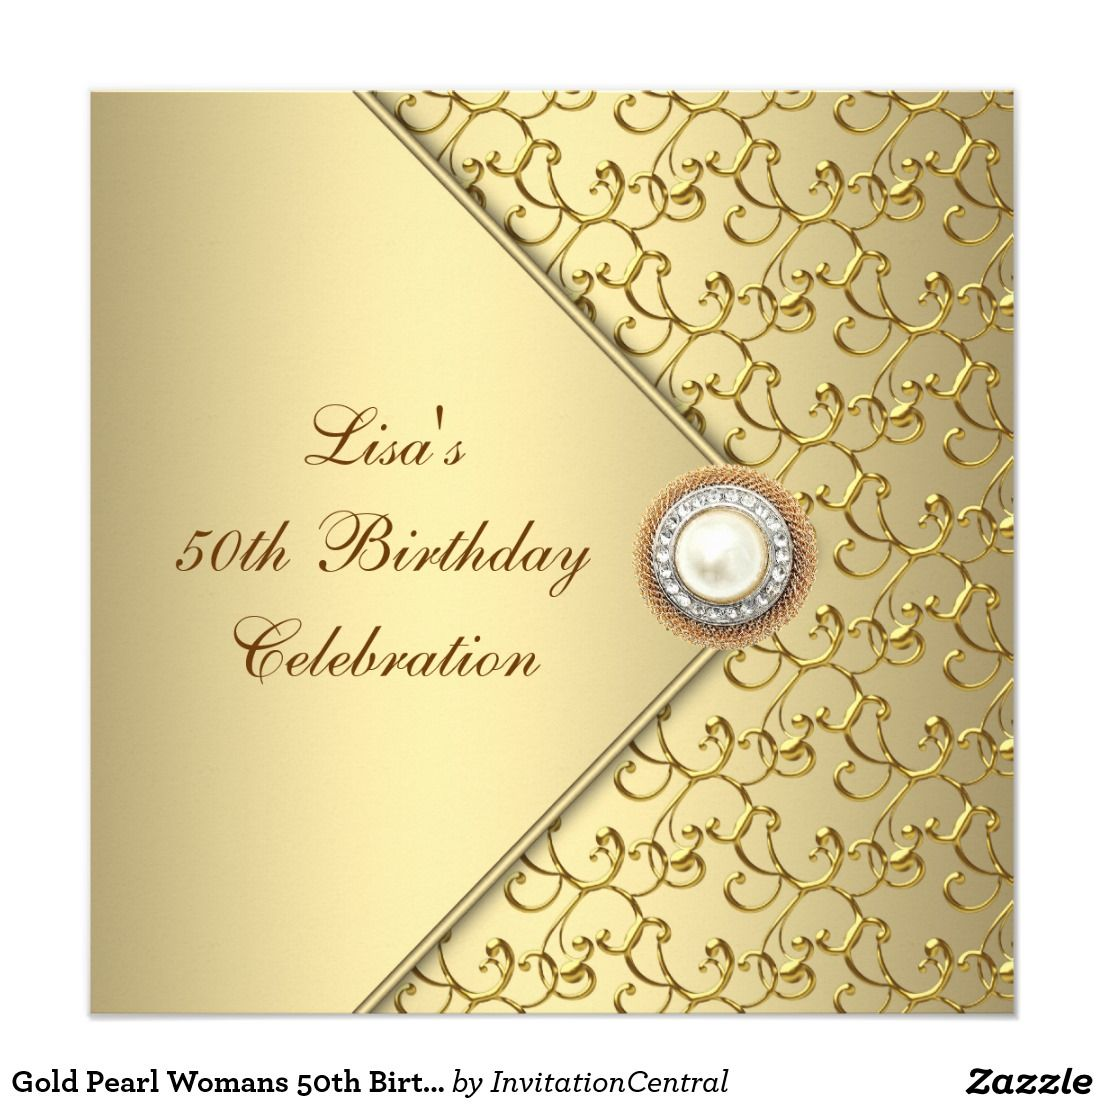 Gold Pearl Womans 50th Birthday Party Invitation Zazzle